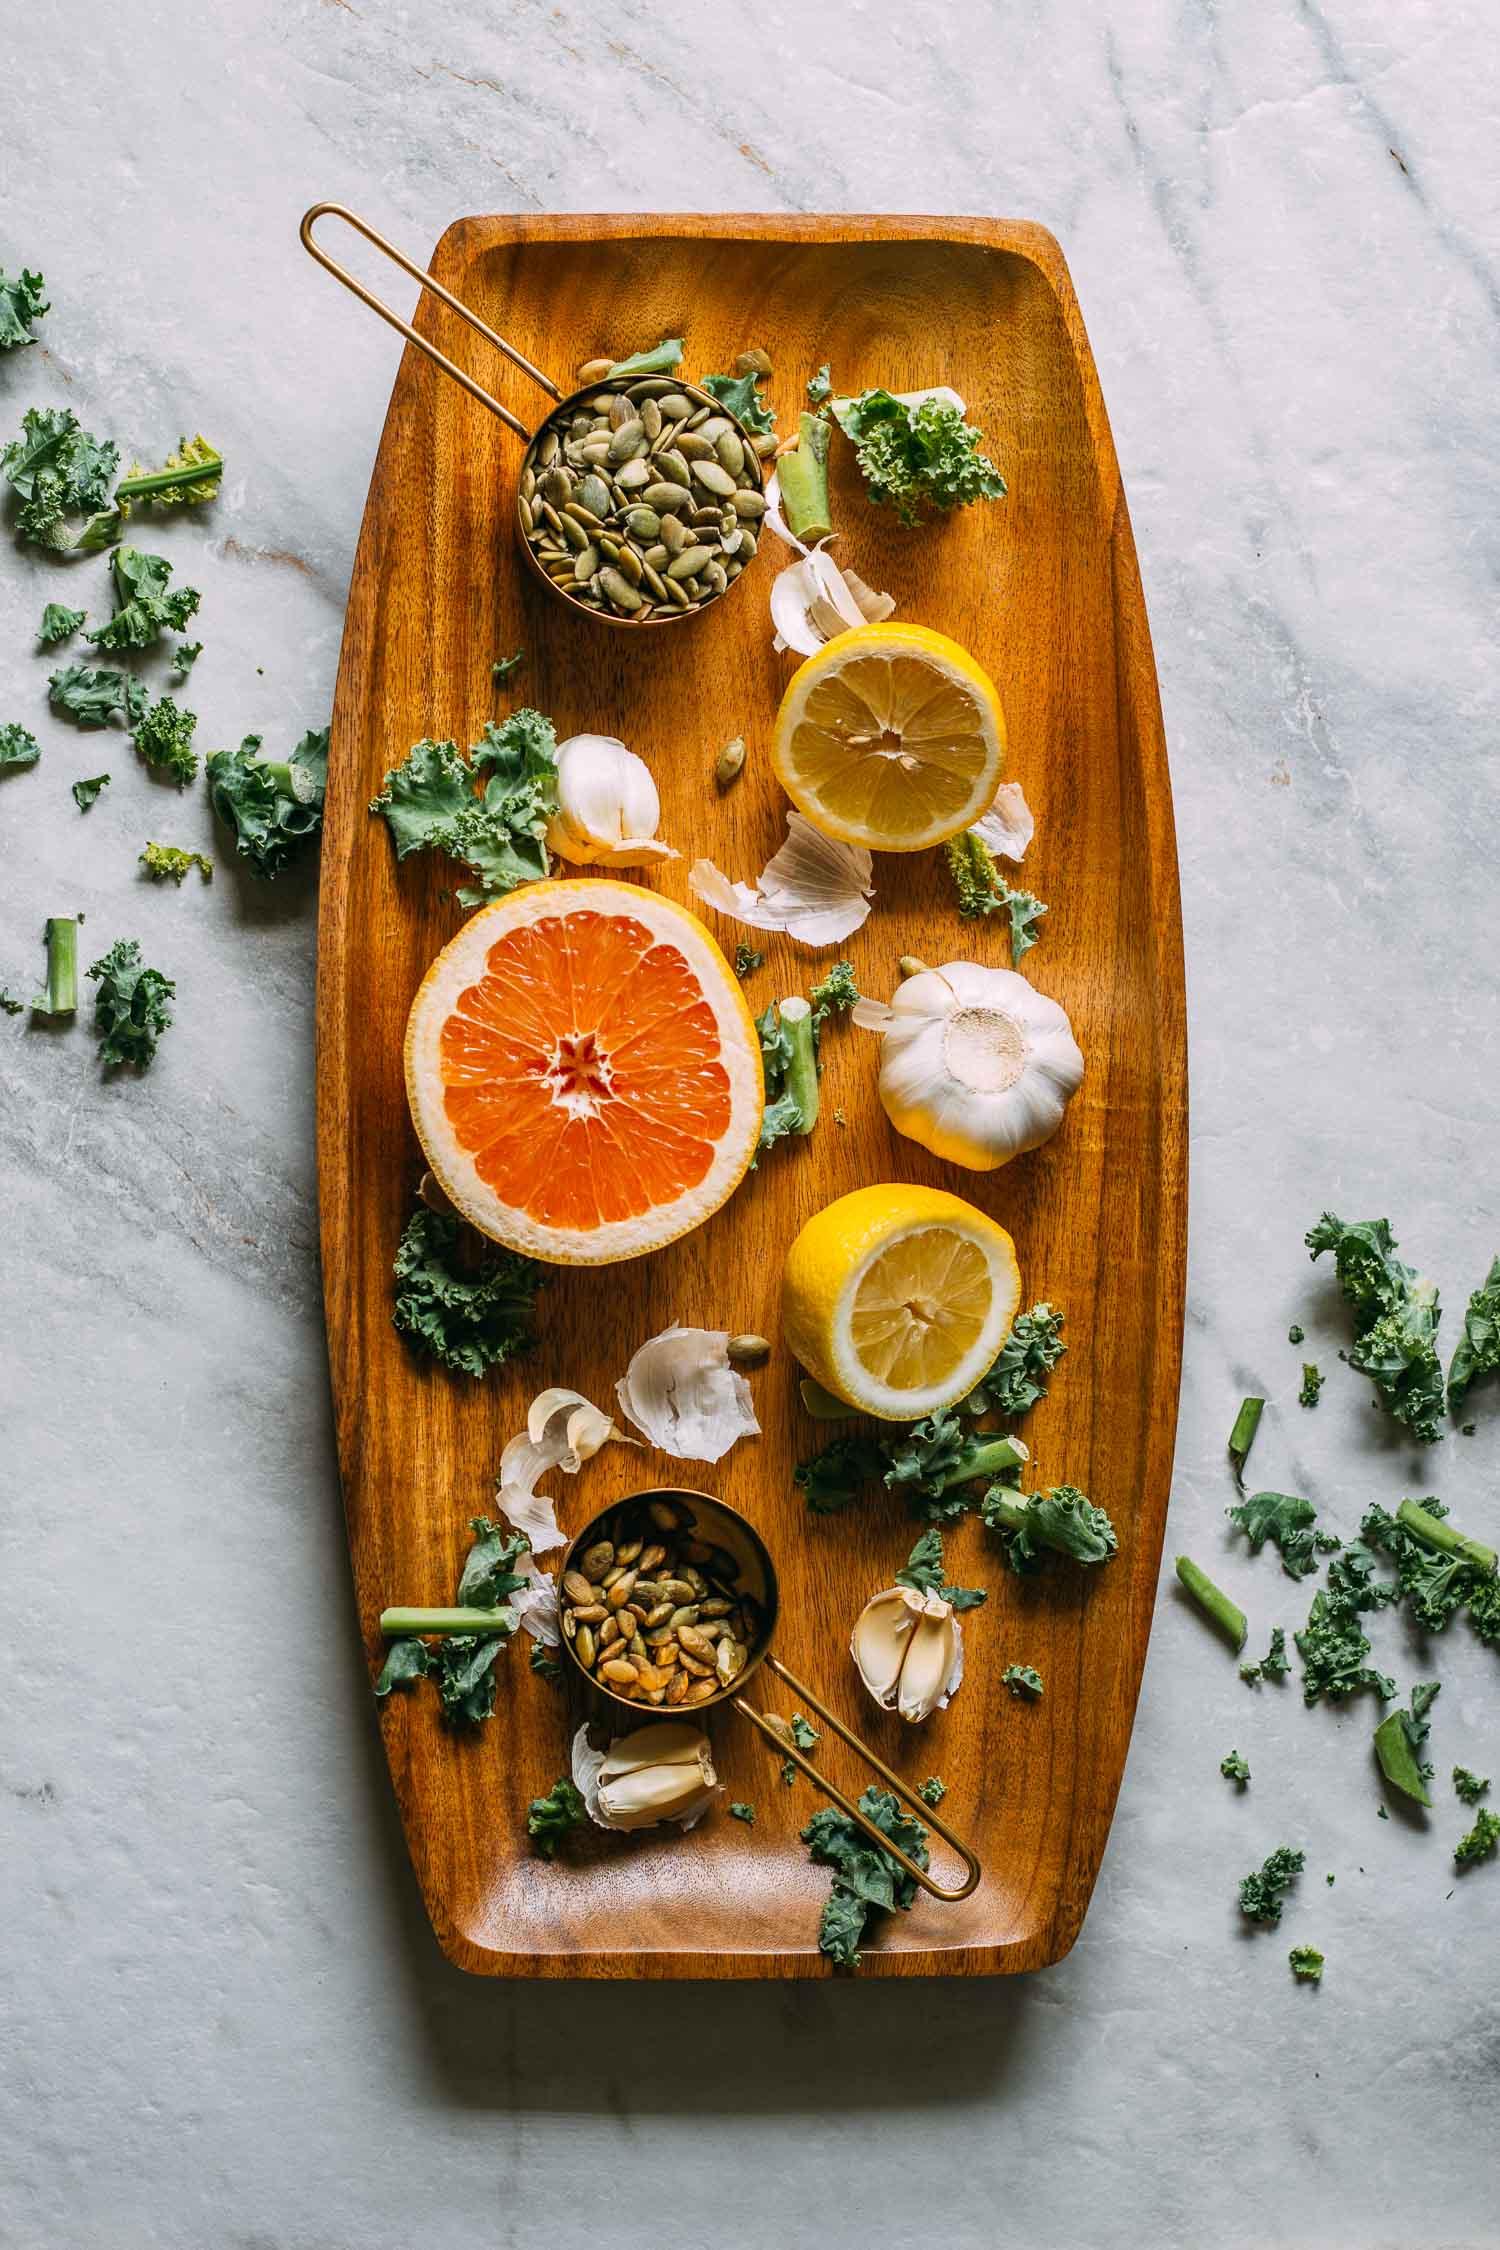 Blueberry Kale Pumpkin Seed Salad #blueberry #pumpkin #seeds #lemon #tahini #citrus #grapefruit #dressing